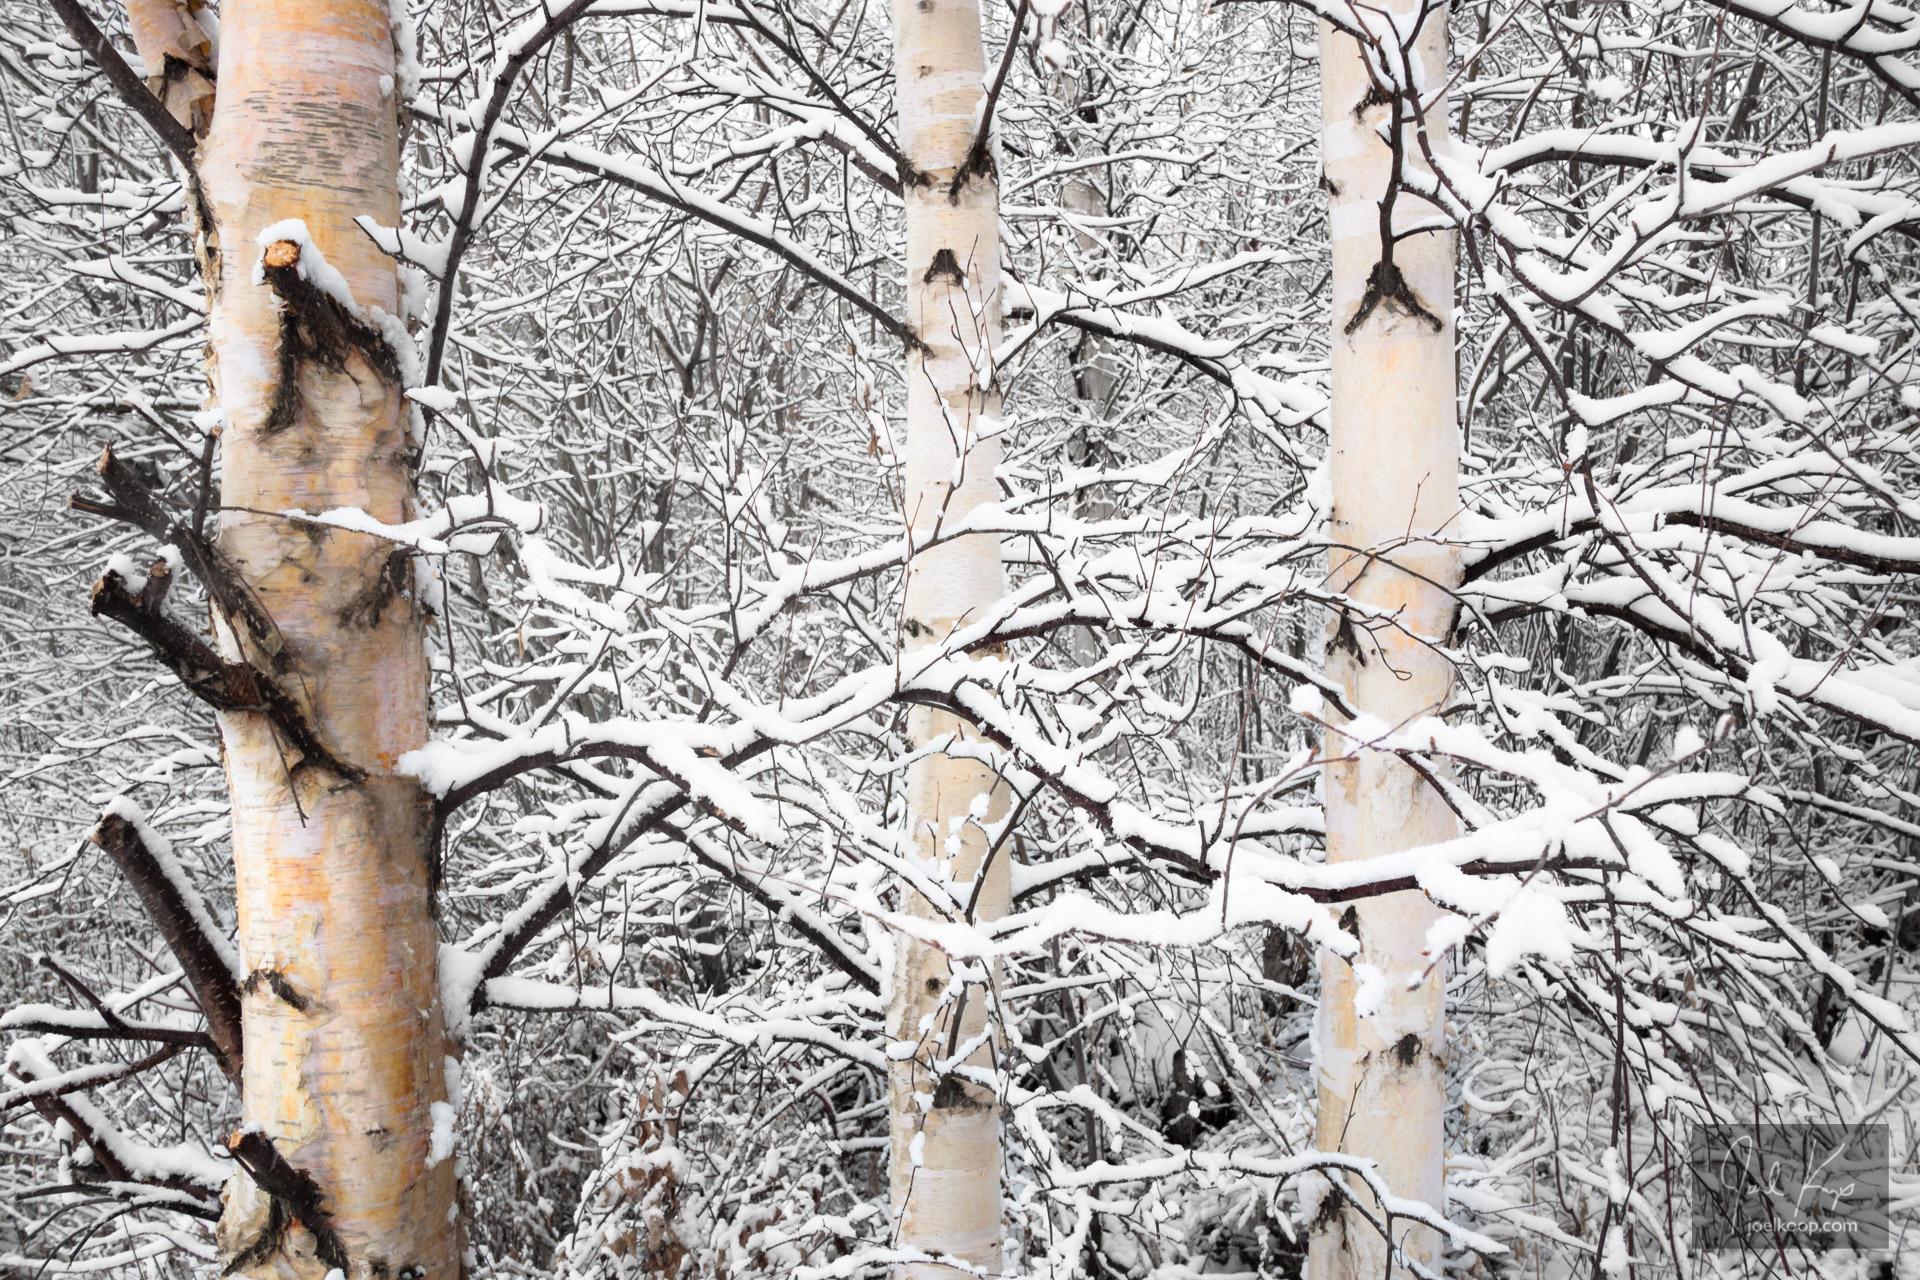 Snow-clad Birch